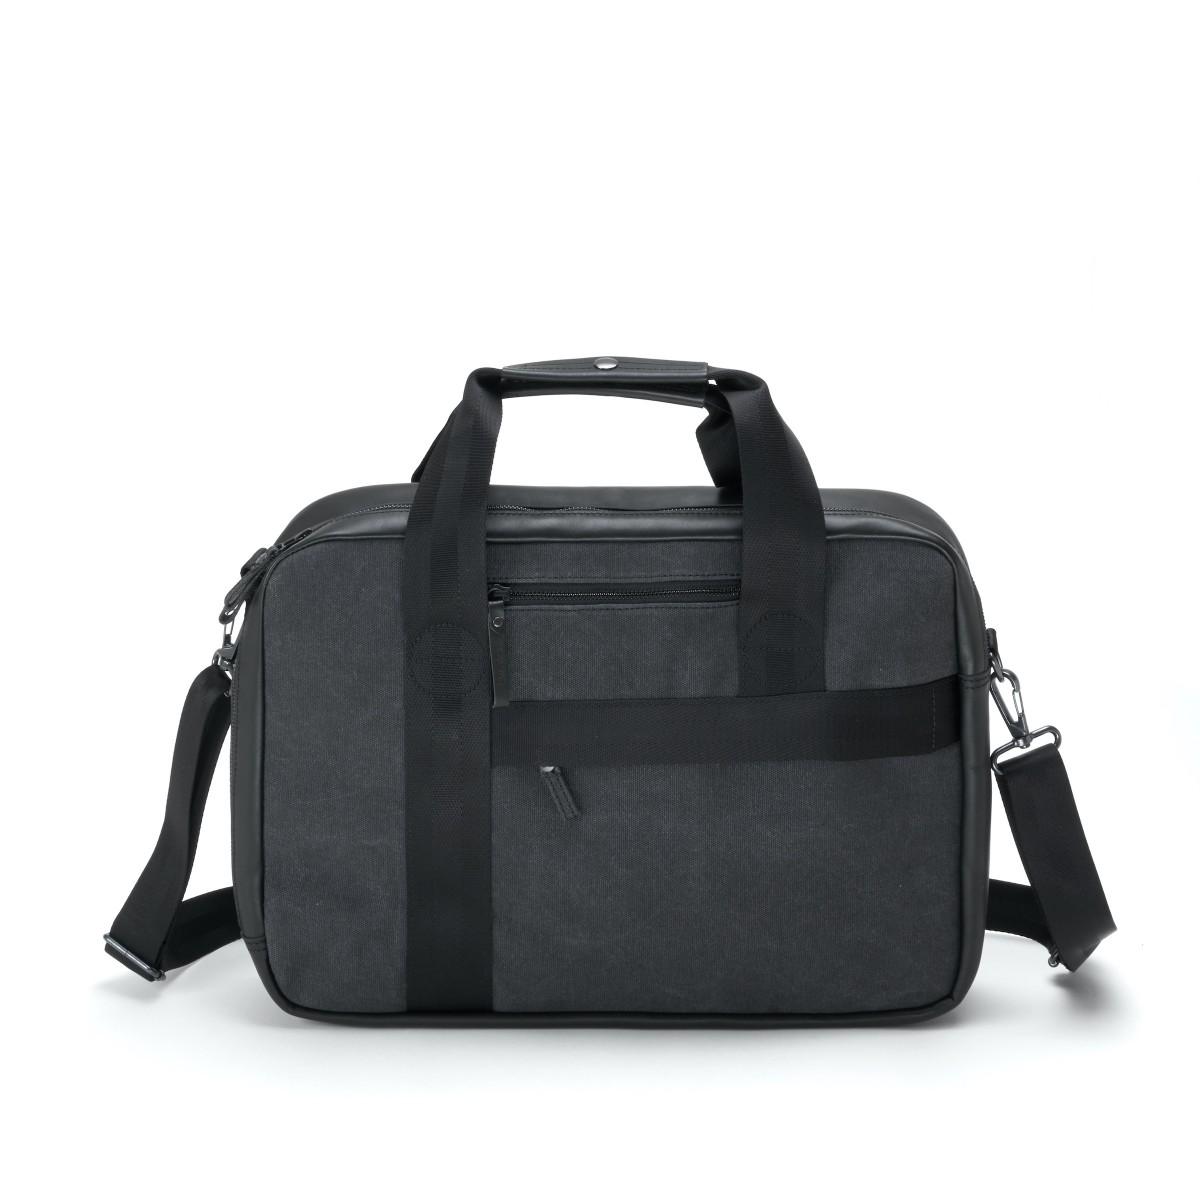 Qwstion Office Bag Väska Mukama